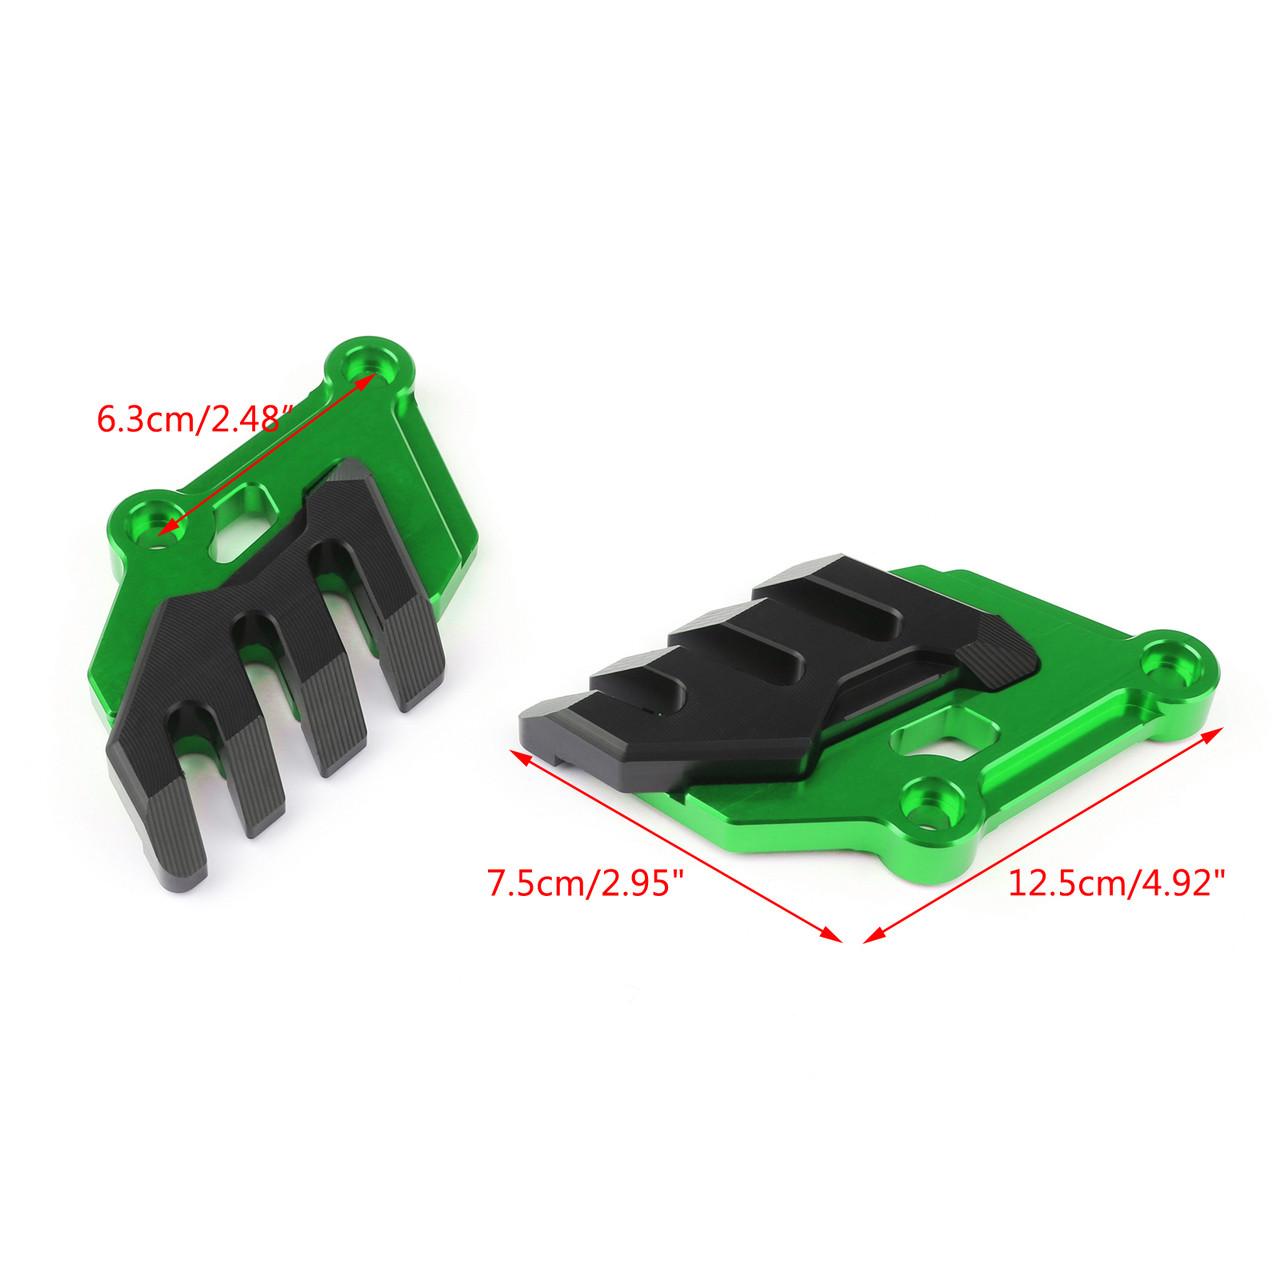 Front Brake Caliper Cover Disc Caliper Protector Cover For Kawasaki Z900 (2017-2019) Green